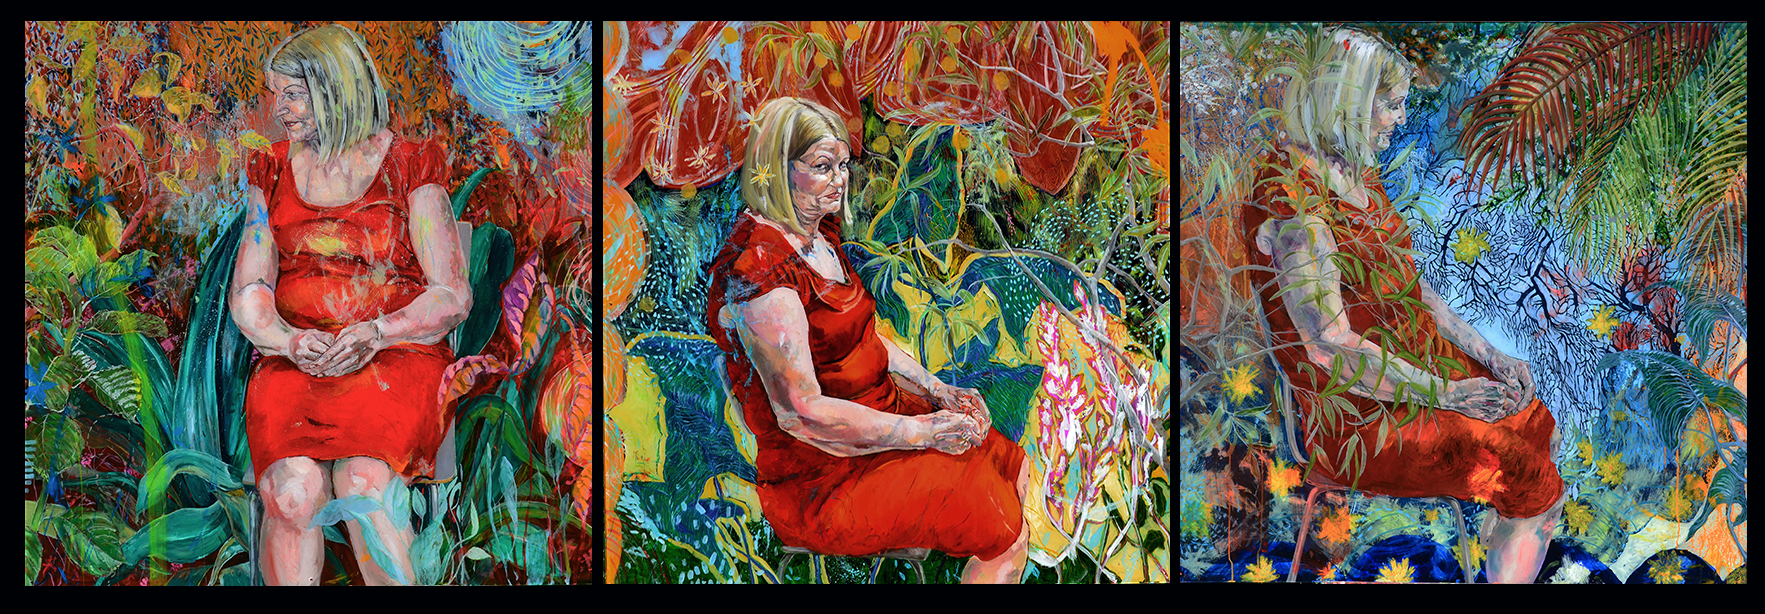 figura em ambiente vegetal . oil on plexiglass . 130 x 390 cm . 3 elementos . 2015